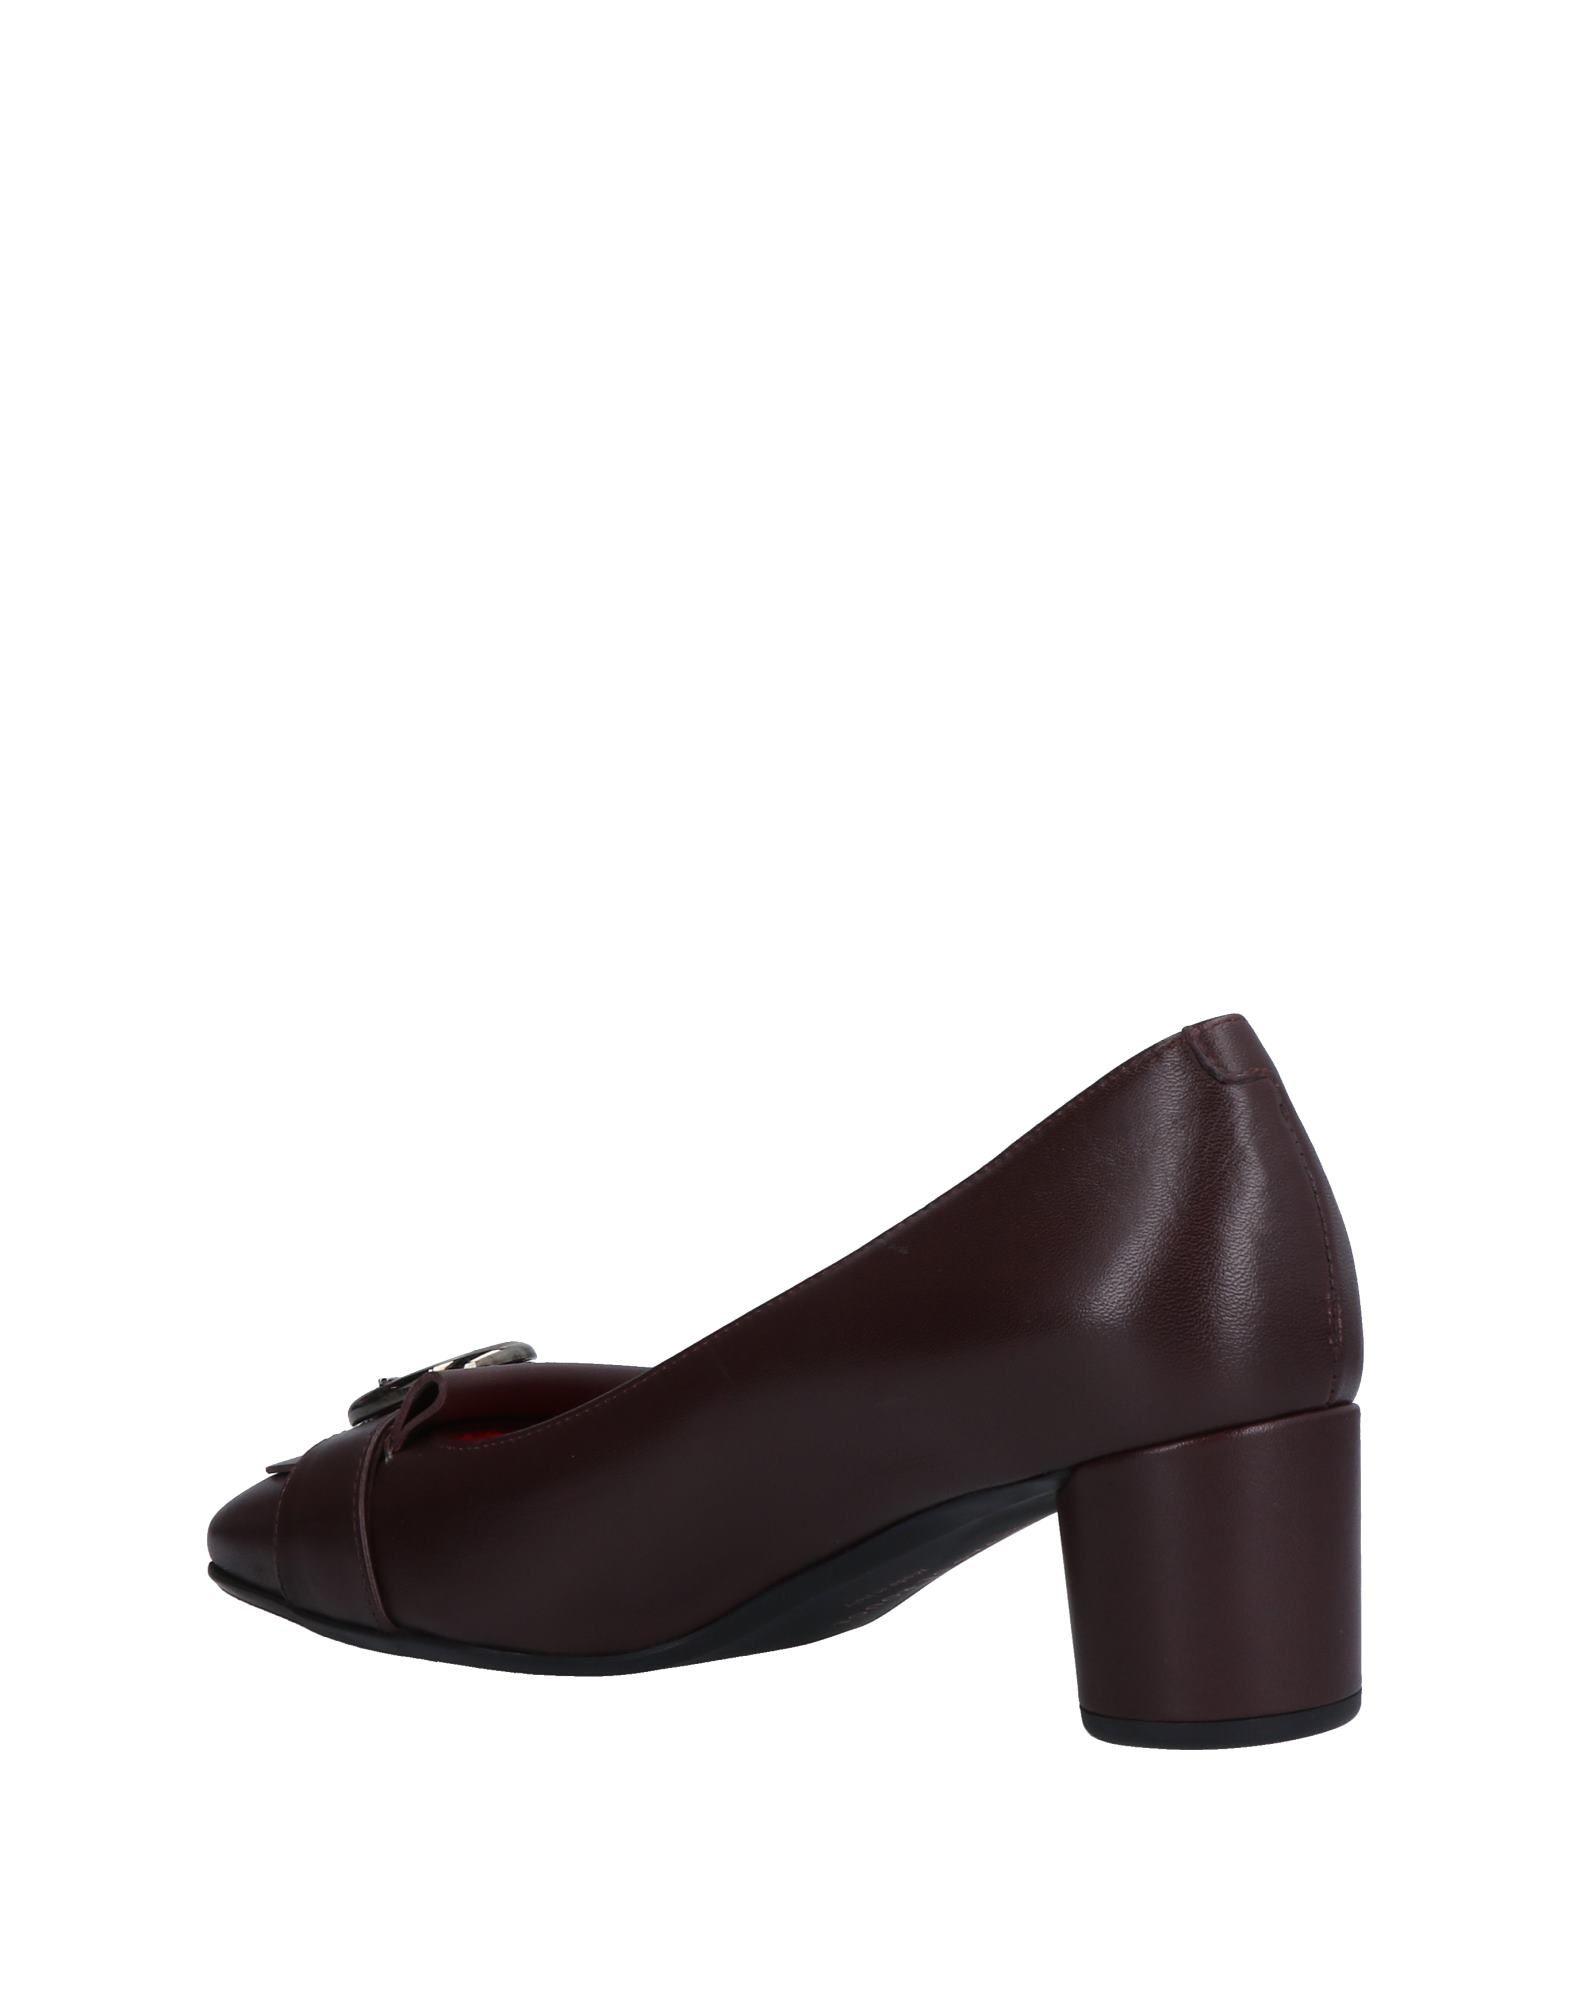 Stilvolle Rouge billige Schuhe Pas De Rouge Stilvolle Mokassins Damen  11510940UQ 793f92